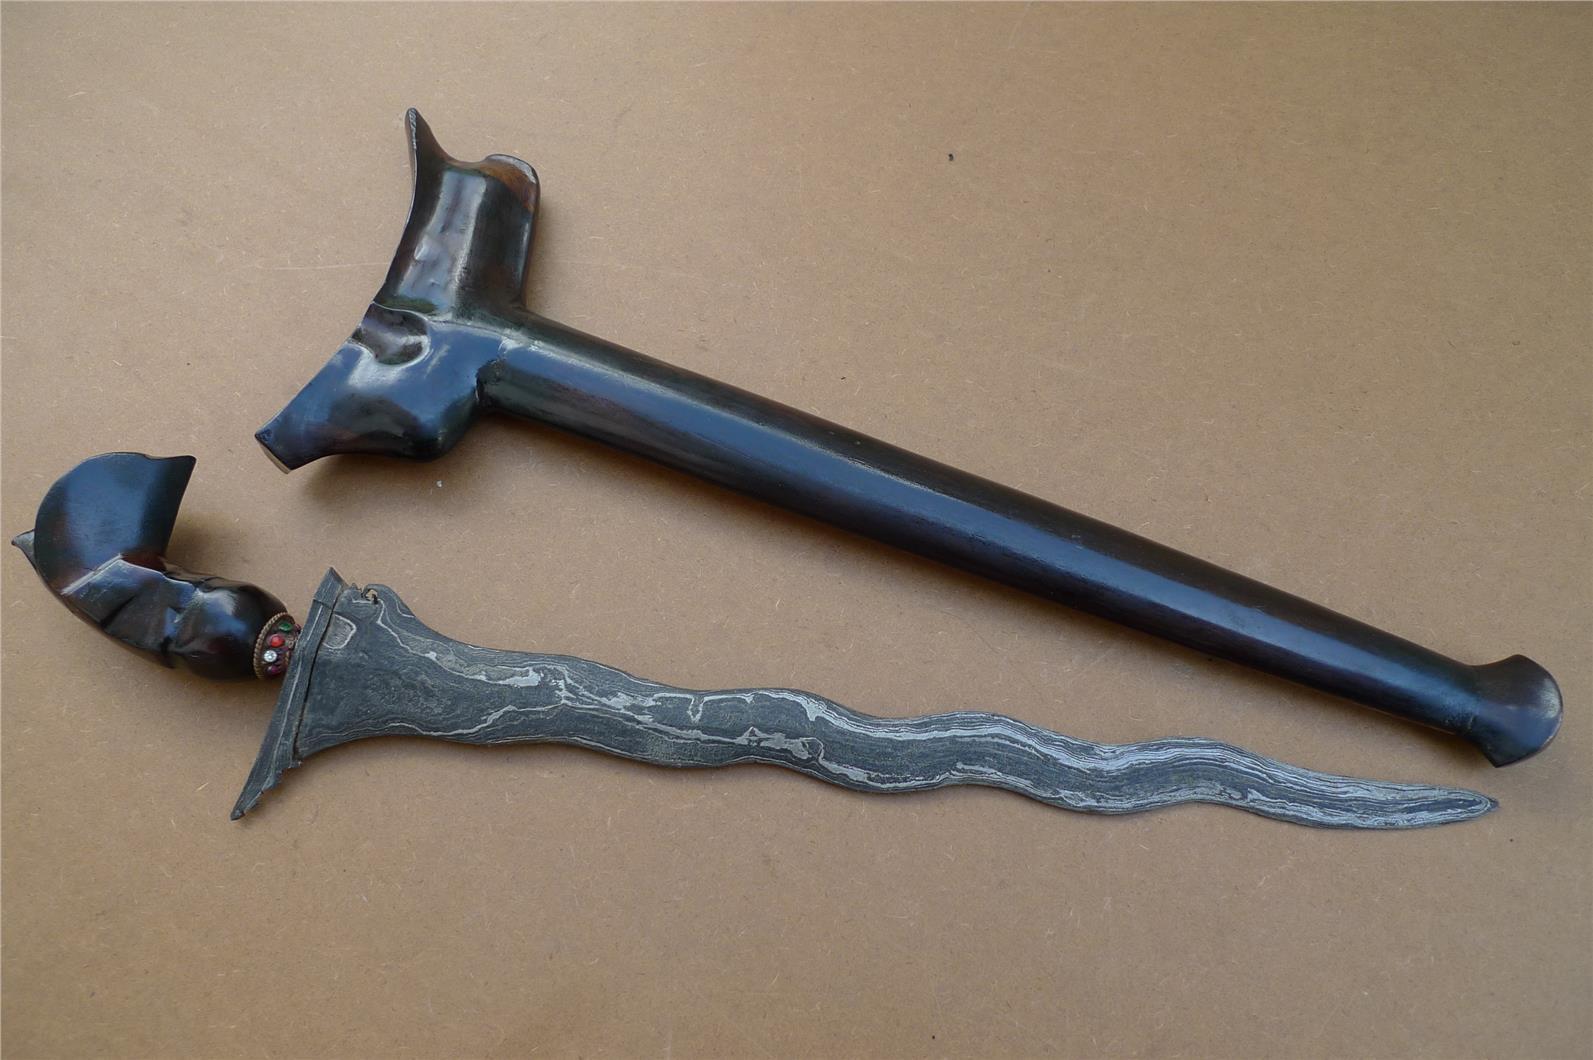 WE01873 WATERMELON SKIN 500mm EXCELLENT KERIS Kriss Weapon Knife Pisau